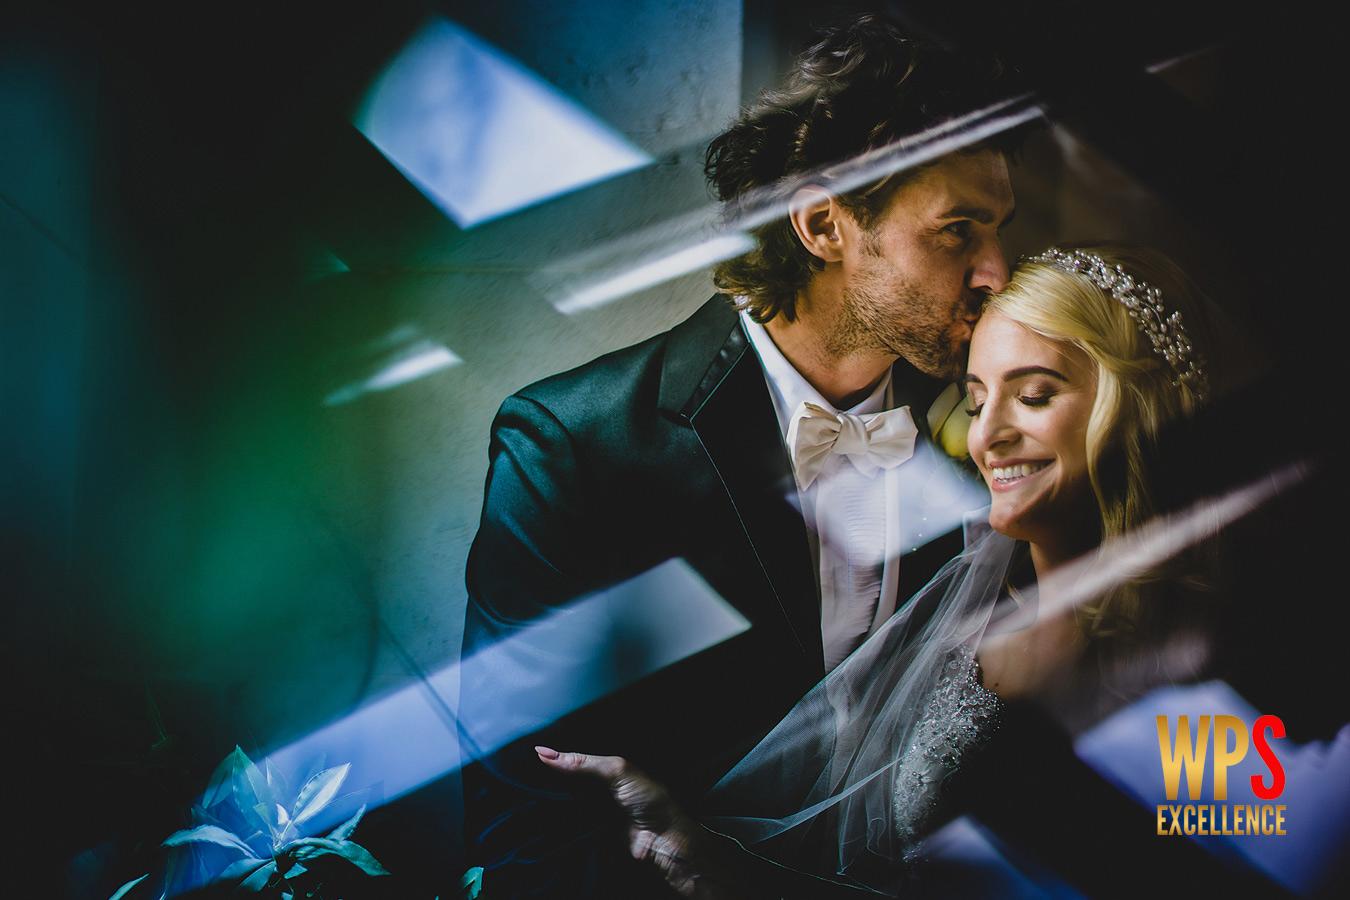 Worlds best wedding photography images - bride groom